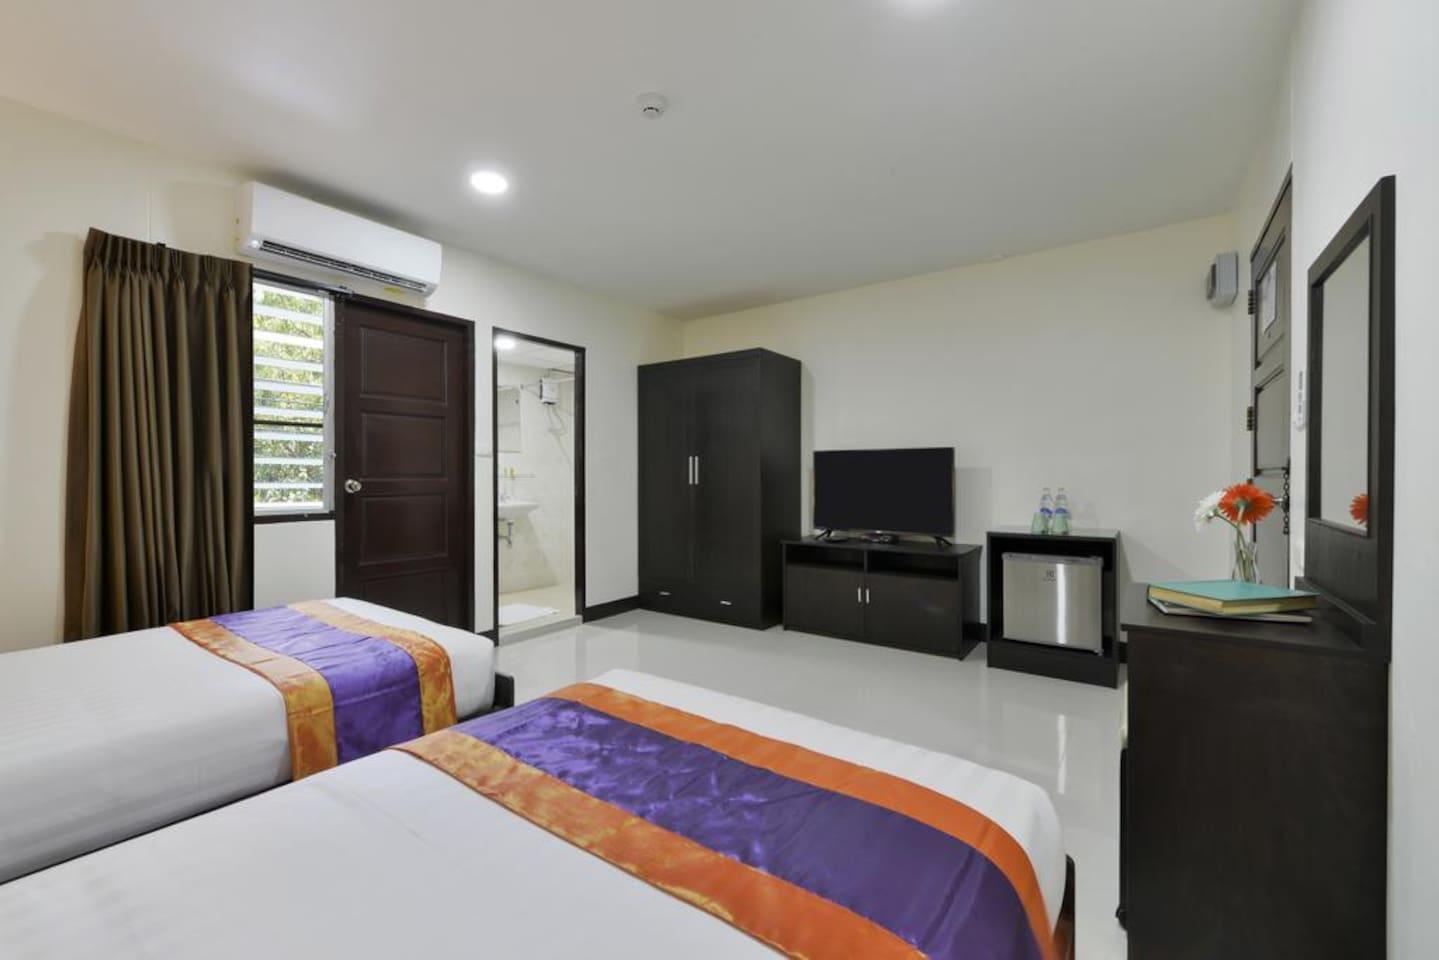 Cosy studio 5 km. to Phrom Phong BTS อพาร์ตเมนต์ 1 ห้องนอน 1 ห้องน้ำส่วนตัว ขนาด 40 ตร.ม. – สุขุมวิท